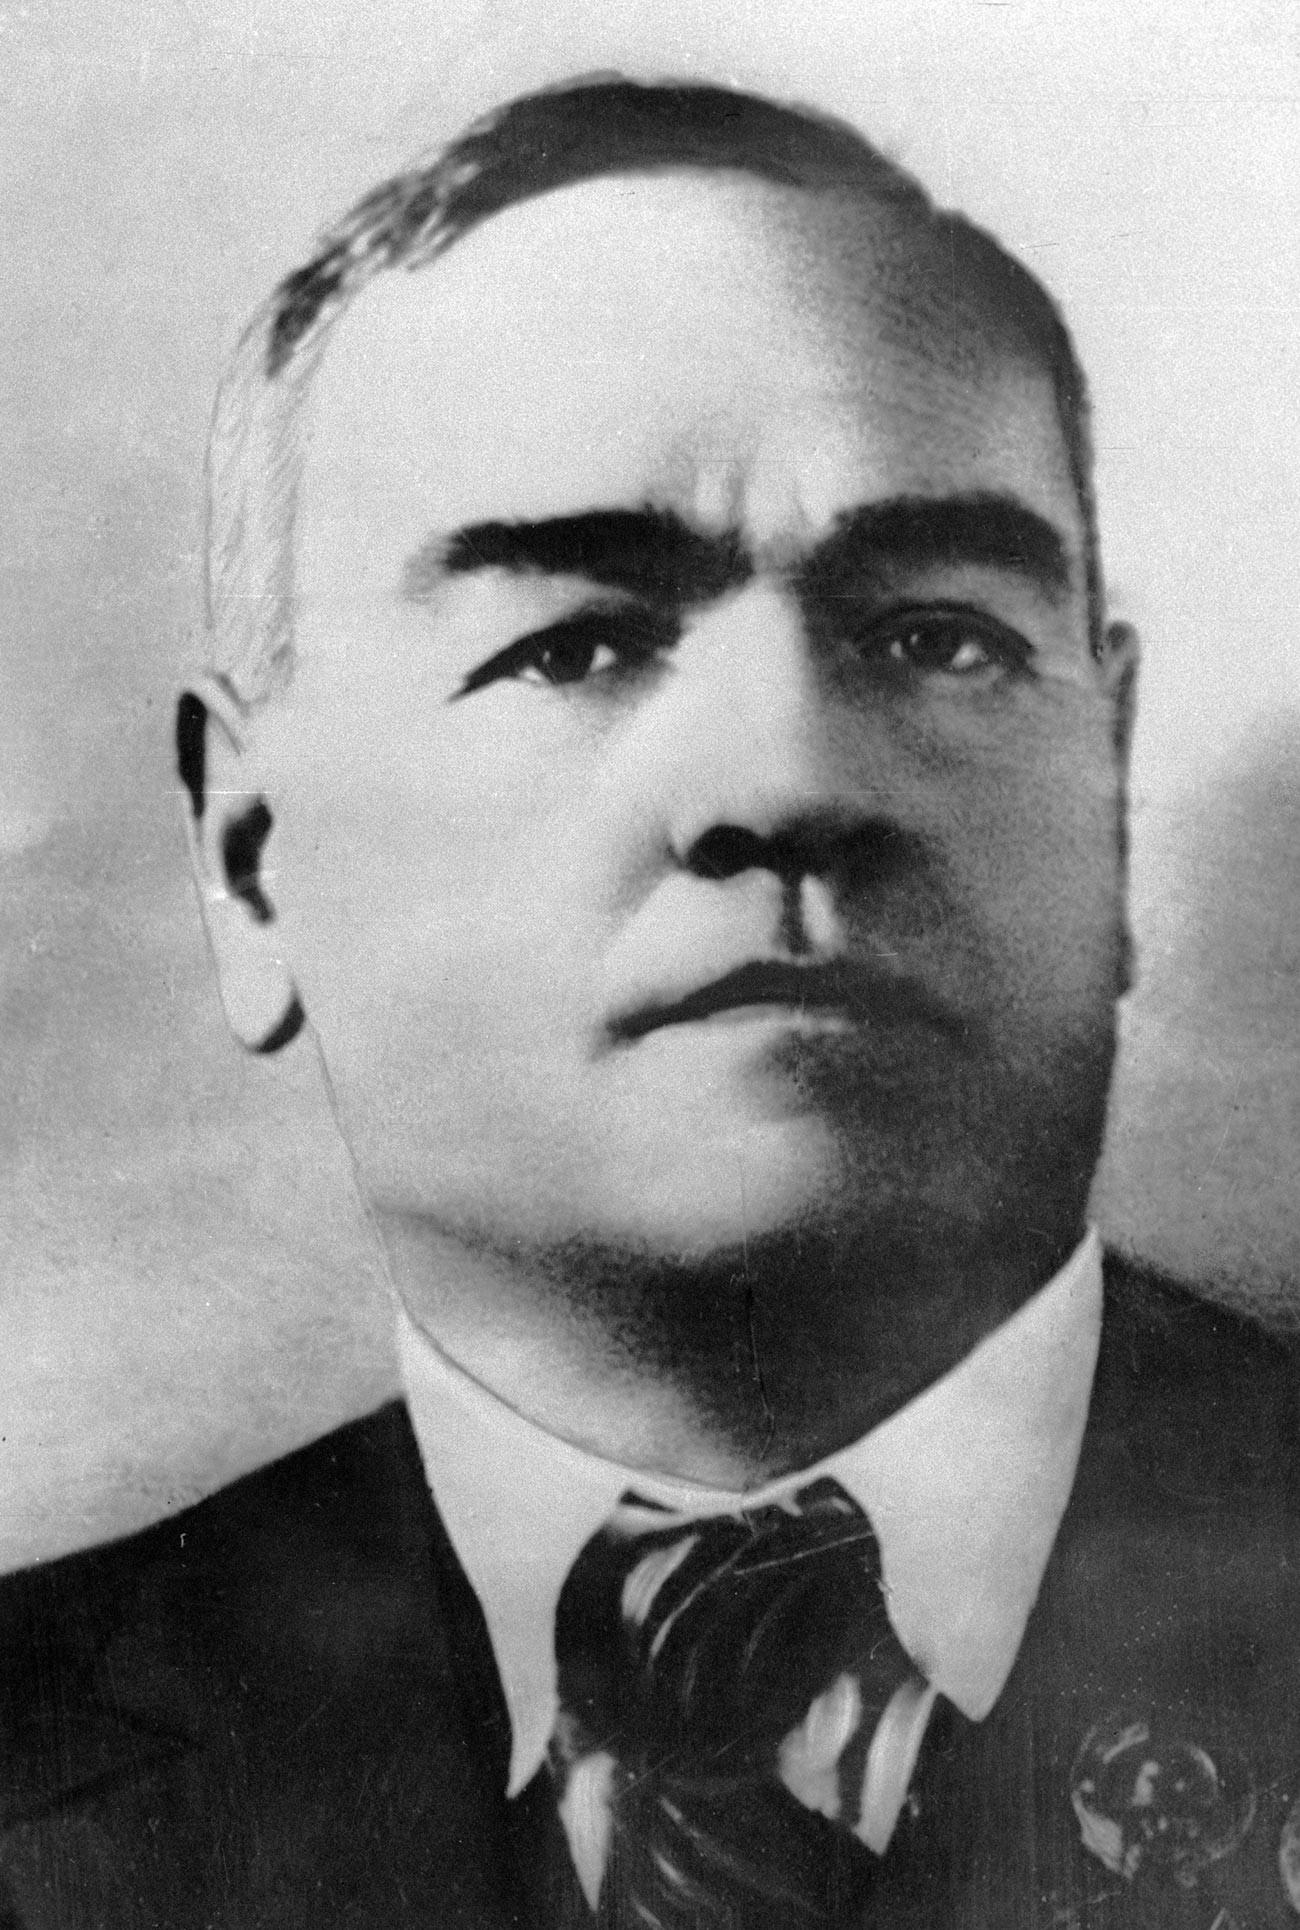 Vladímir Petliákov